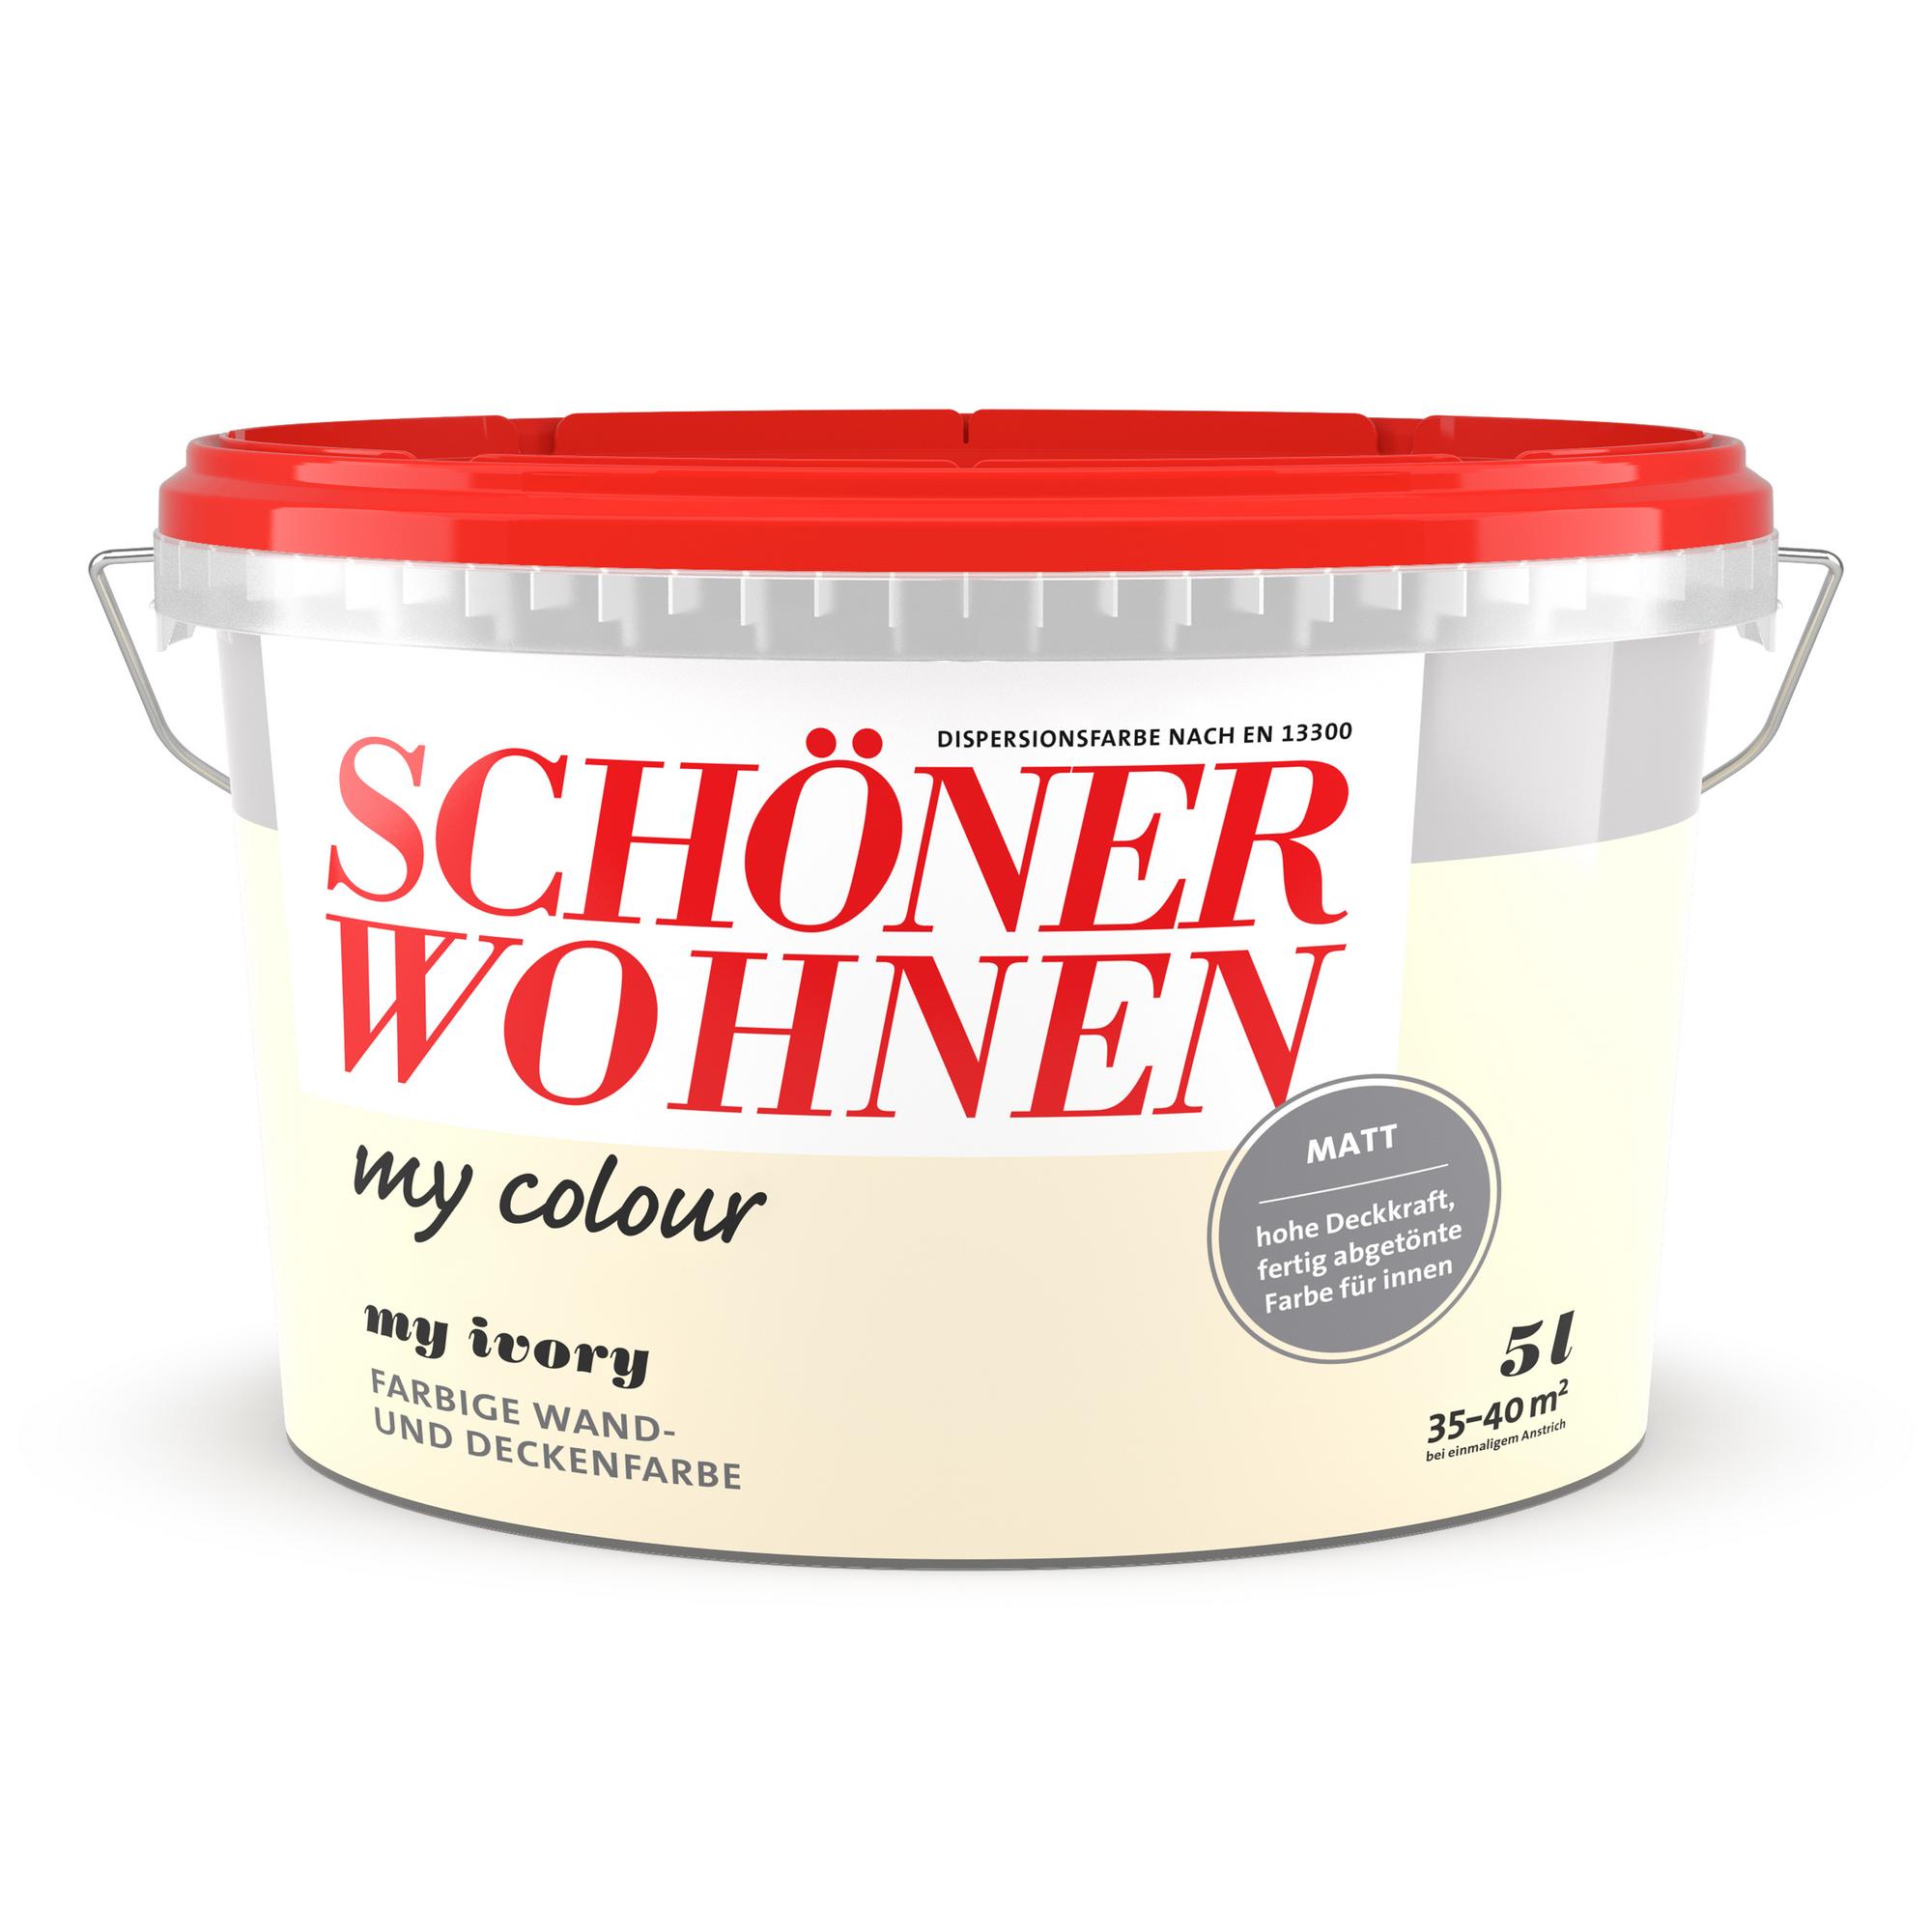 Wandfarbe Bunt Online Bestellen ǀ Toom Baumarkt